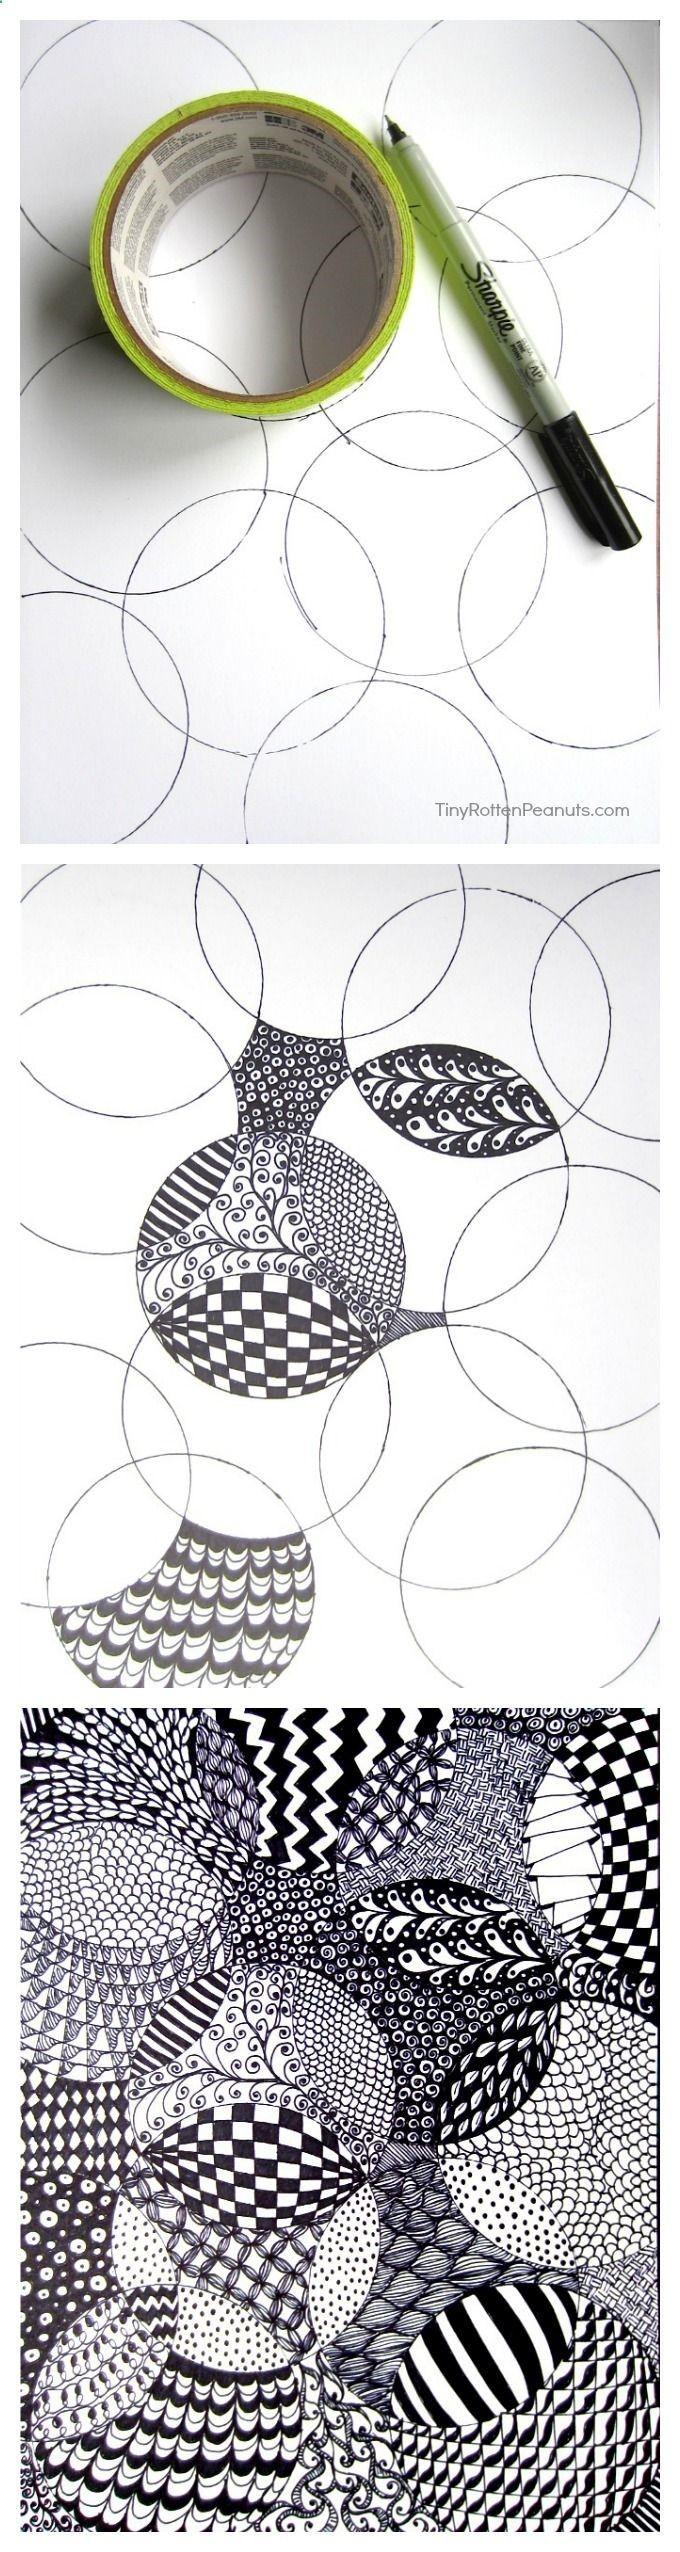 Totally Easy Zentangle | Dibujar, Dibujo y Quiero